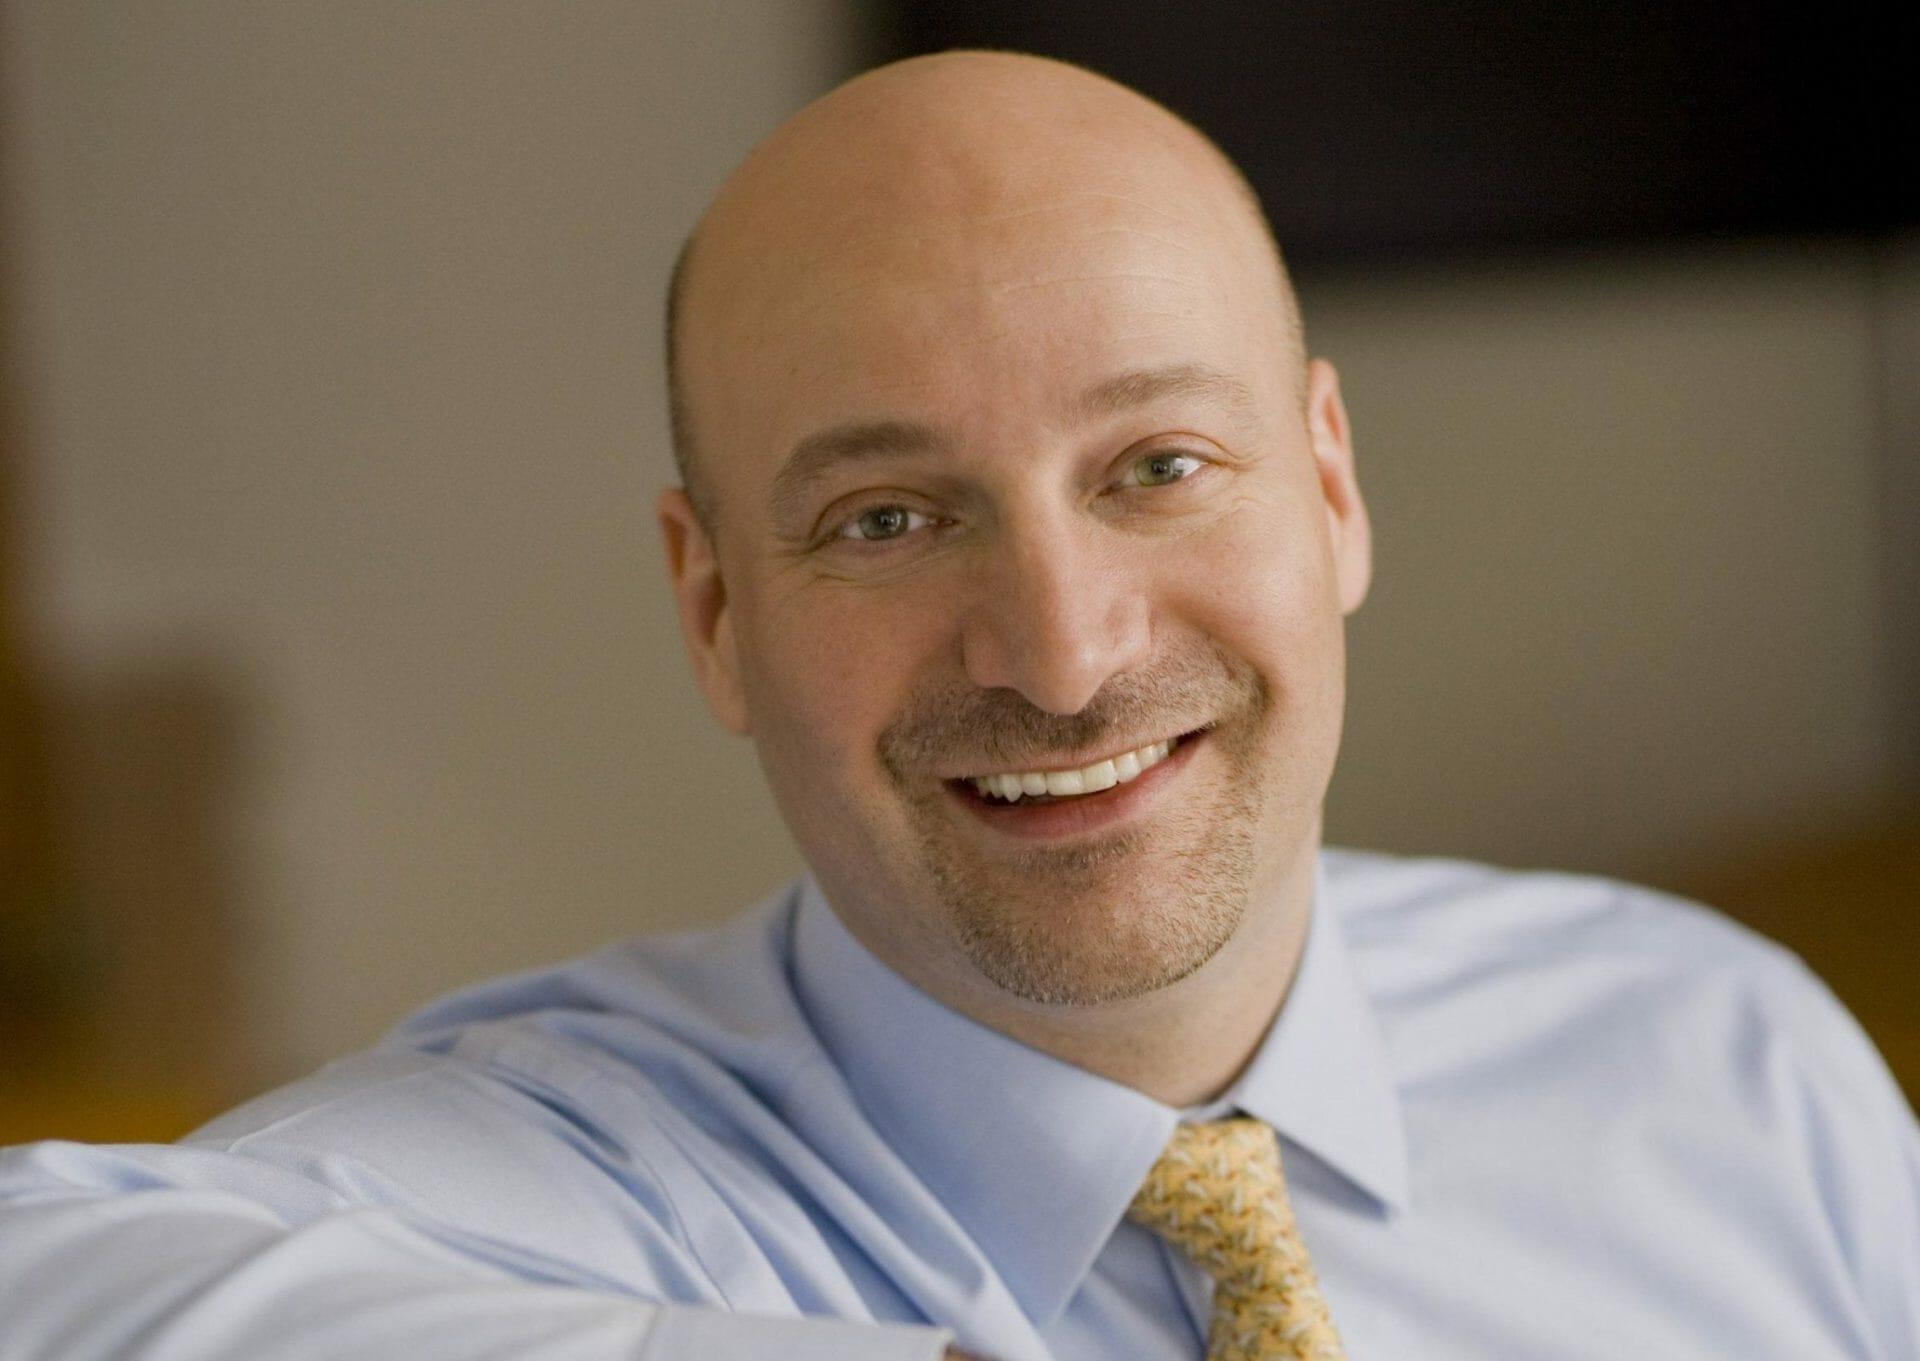 Jacob Gottlieb